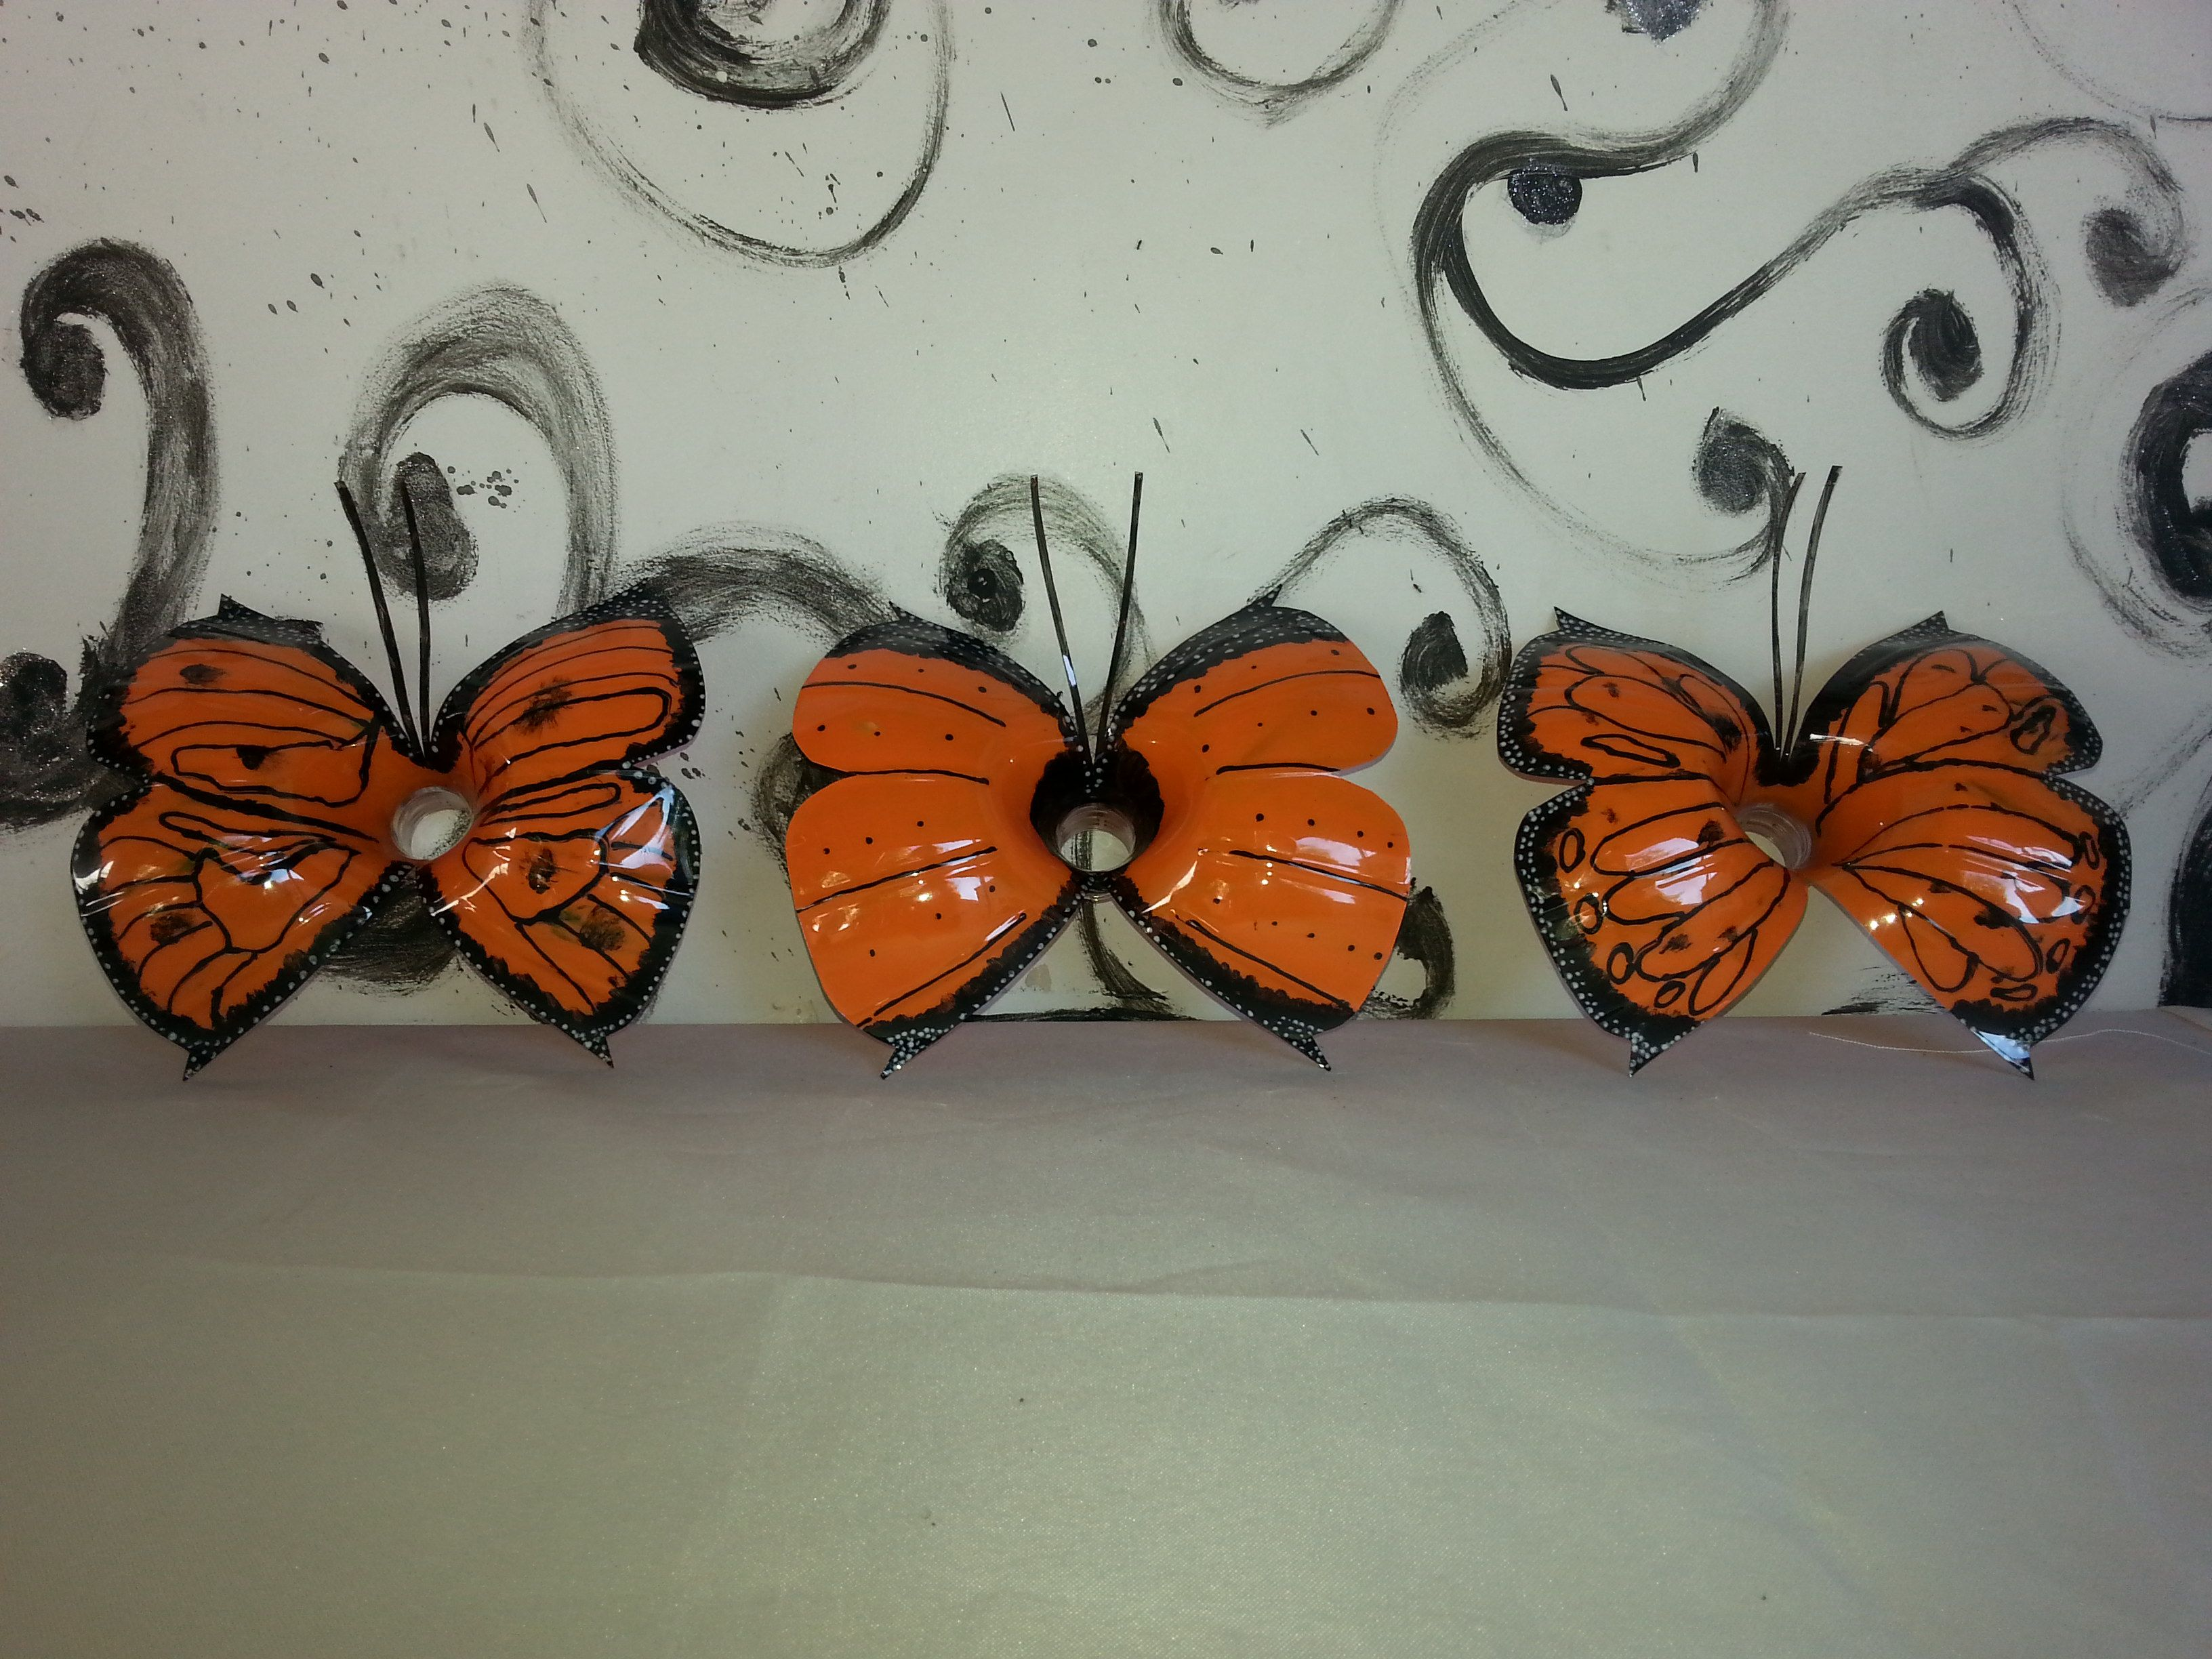 Fly Fly Butterfly ButterflyBottlesRecyclingUpcycleButterflies Fly Fly Butterfly